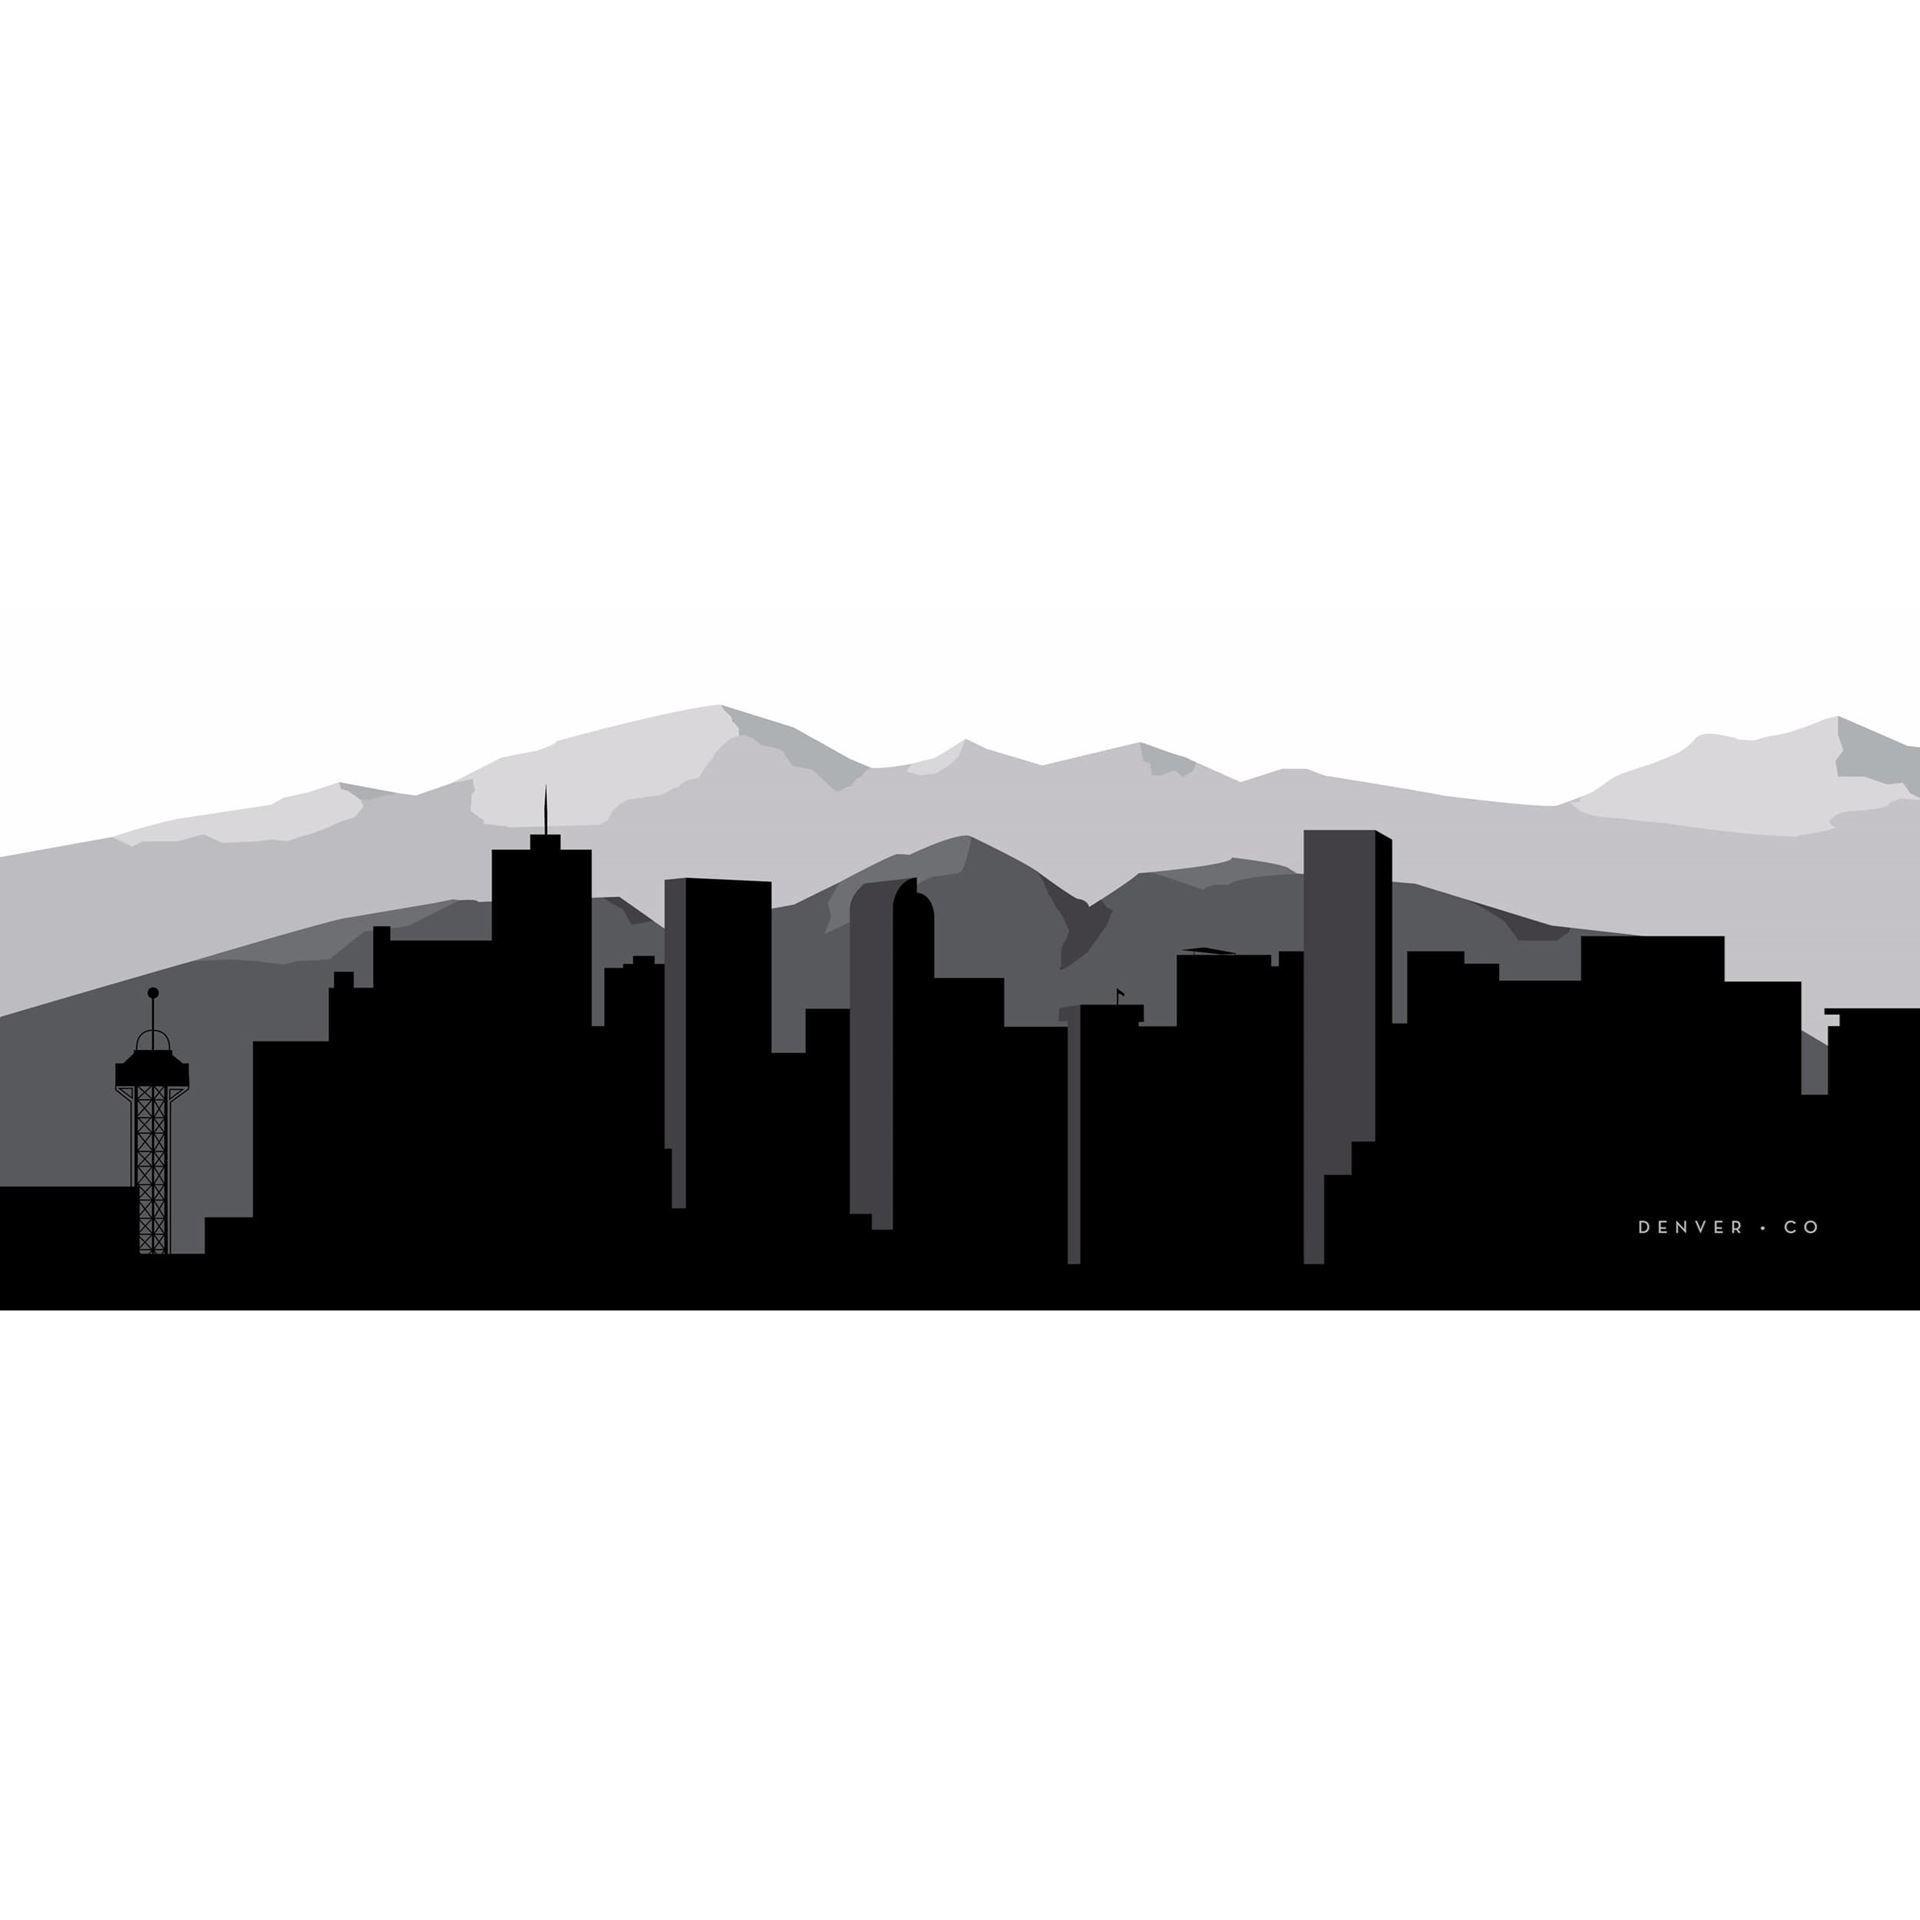 denver graphic skyline 60x20 125